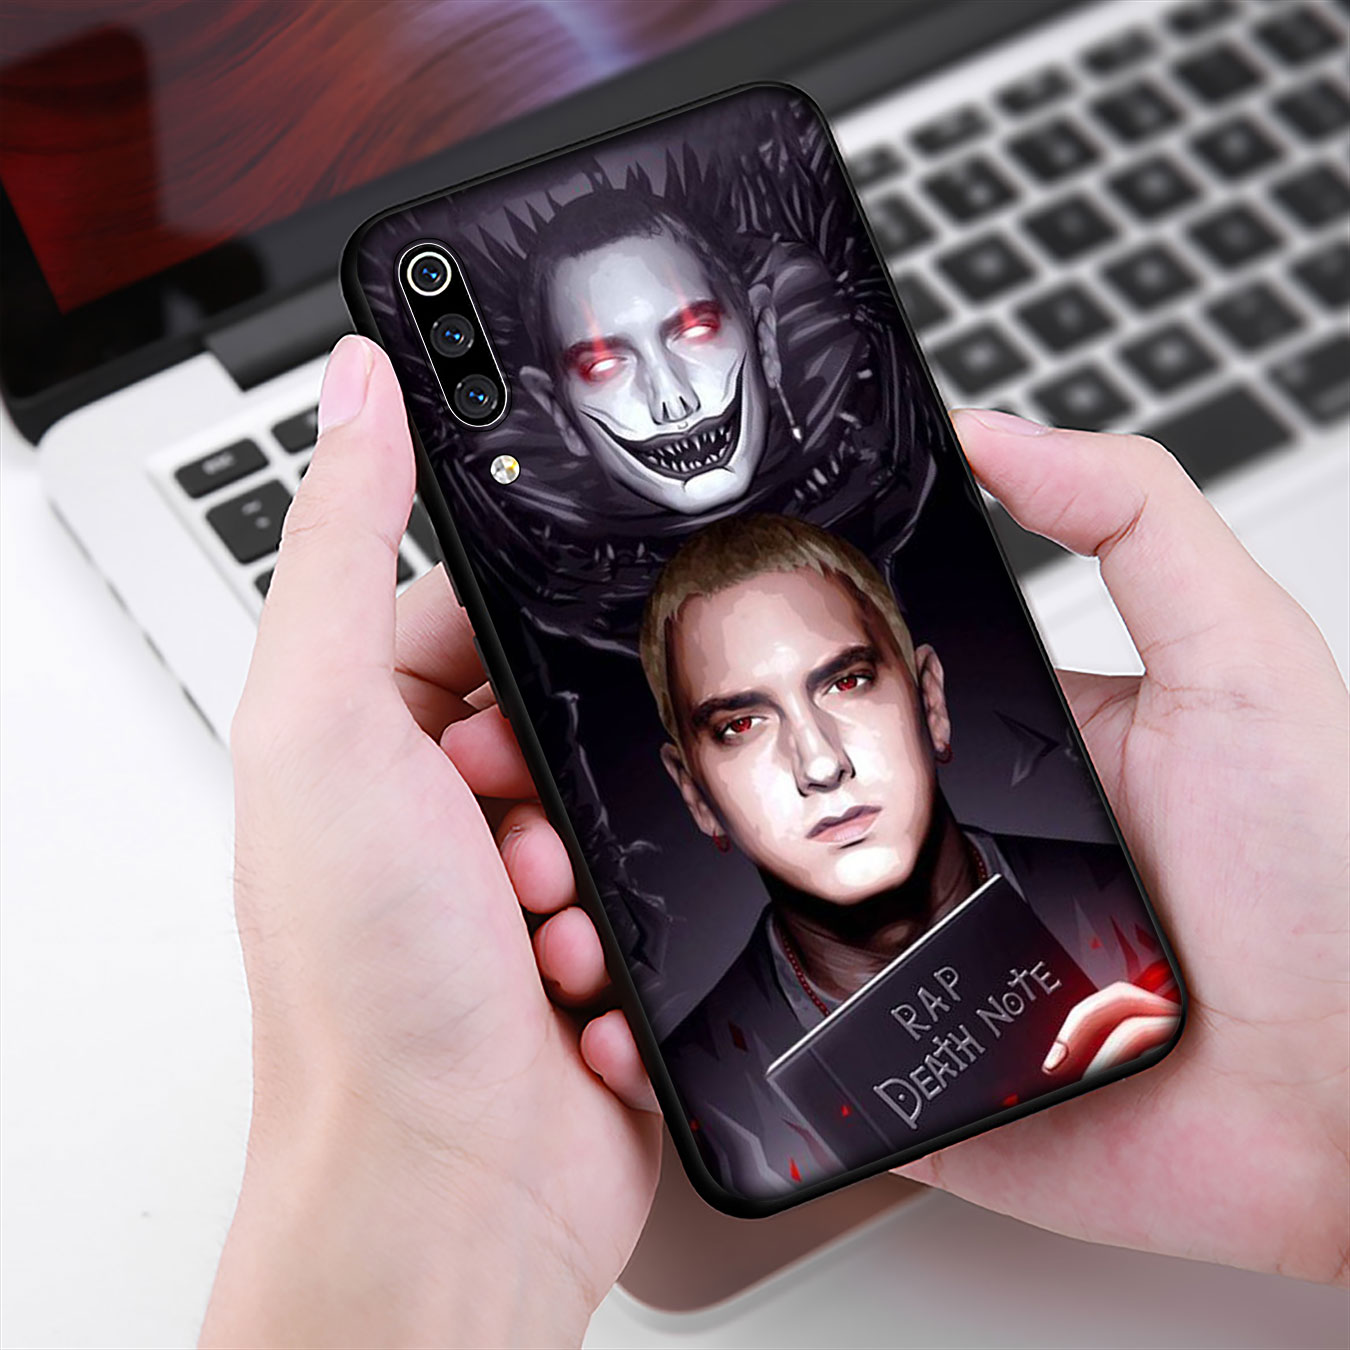 Eminem Mile Rap Soft TPU Silicone Phone Case For Xiaomi Redmi Note 8 8A 8T 7 7A 6 6A 5 5A GO S2 K30 K20 Pro Cover